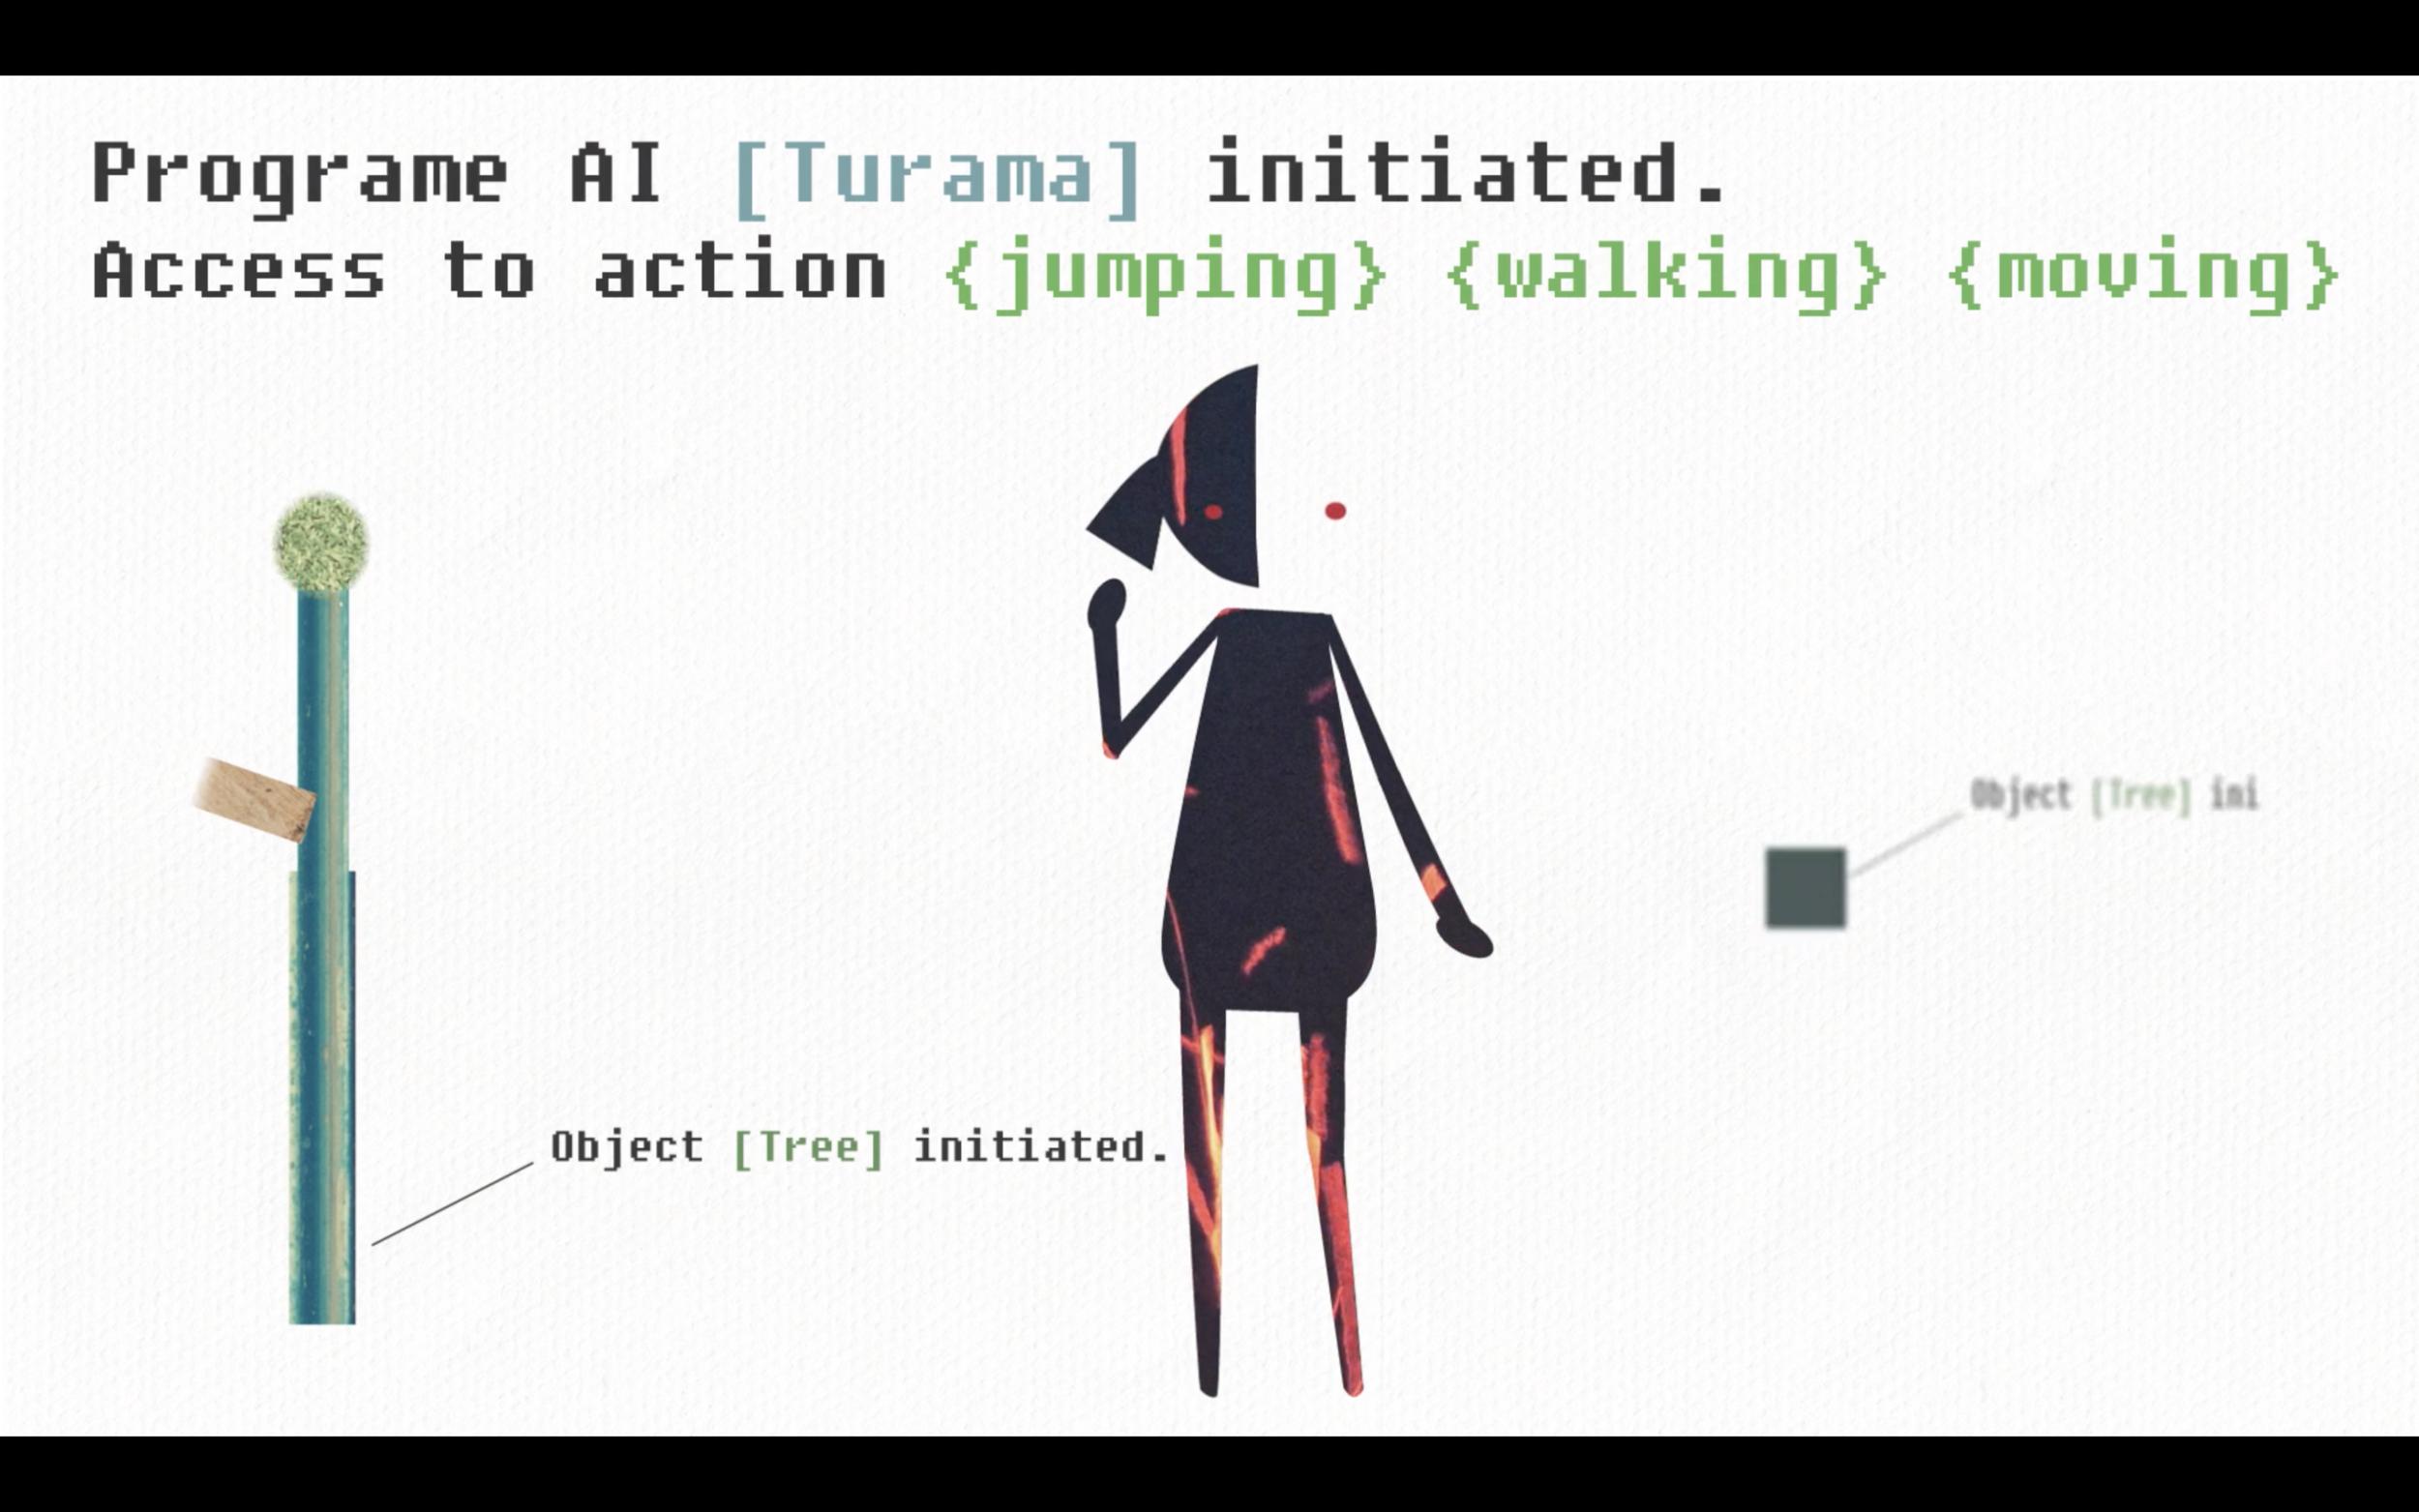 Turama and the world initiated